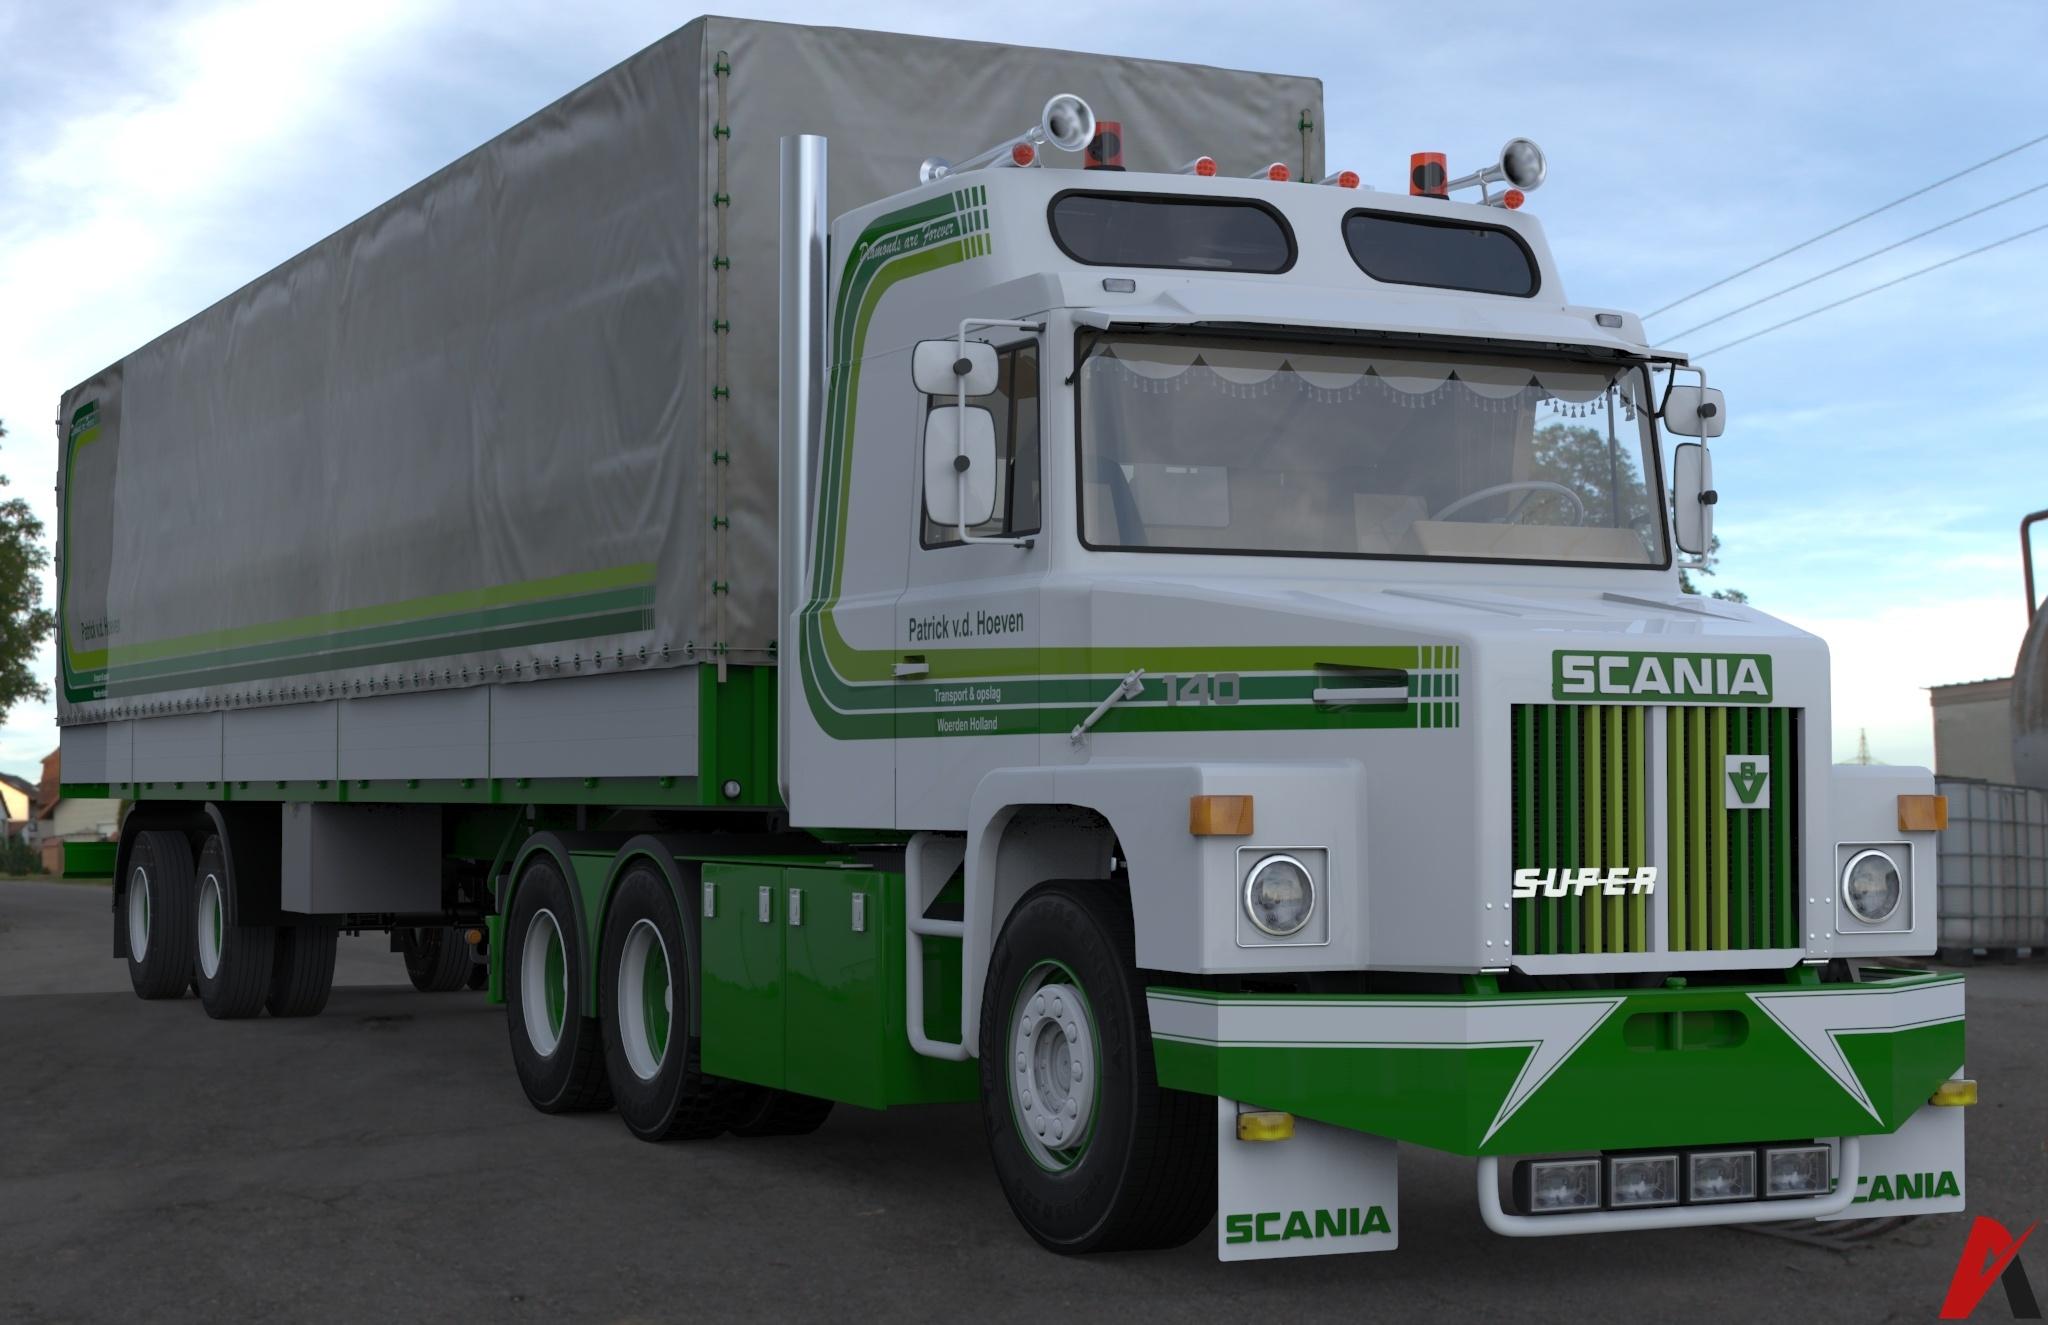 3D Scania 140 L 6×2 Patrick v.d. Hoeven & 2 Axled Curtain Trailer